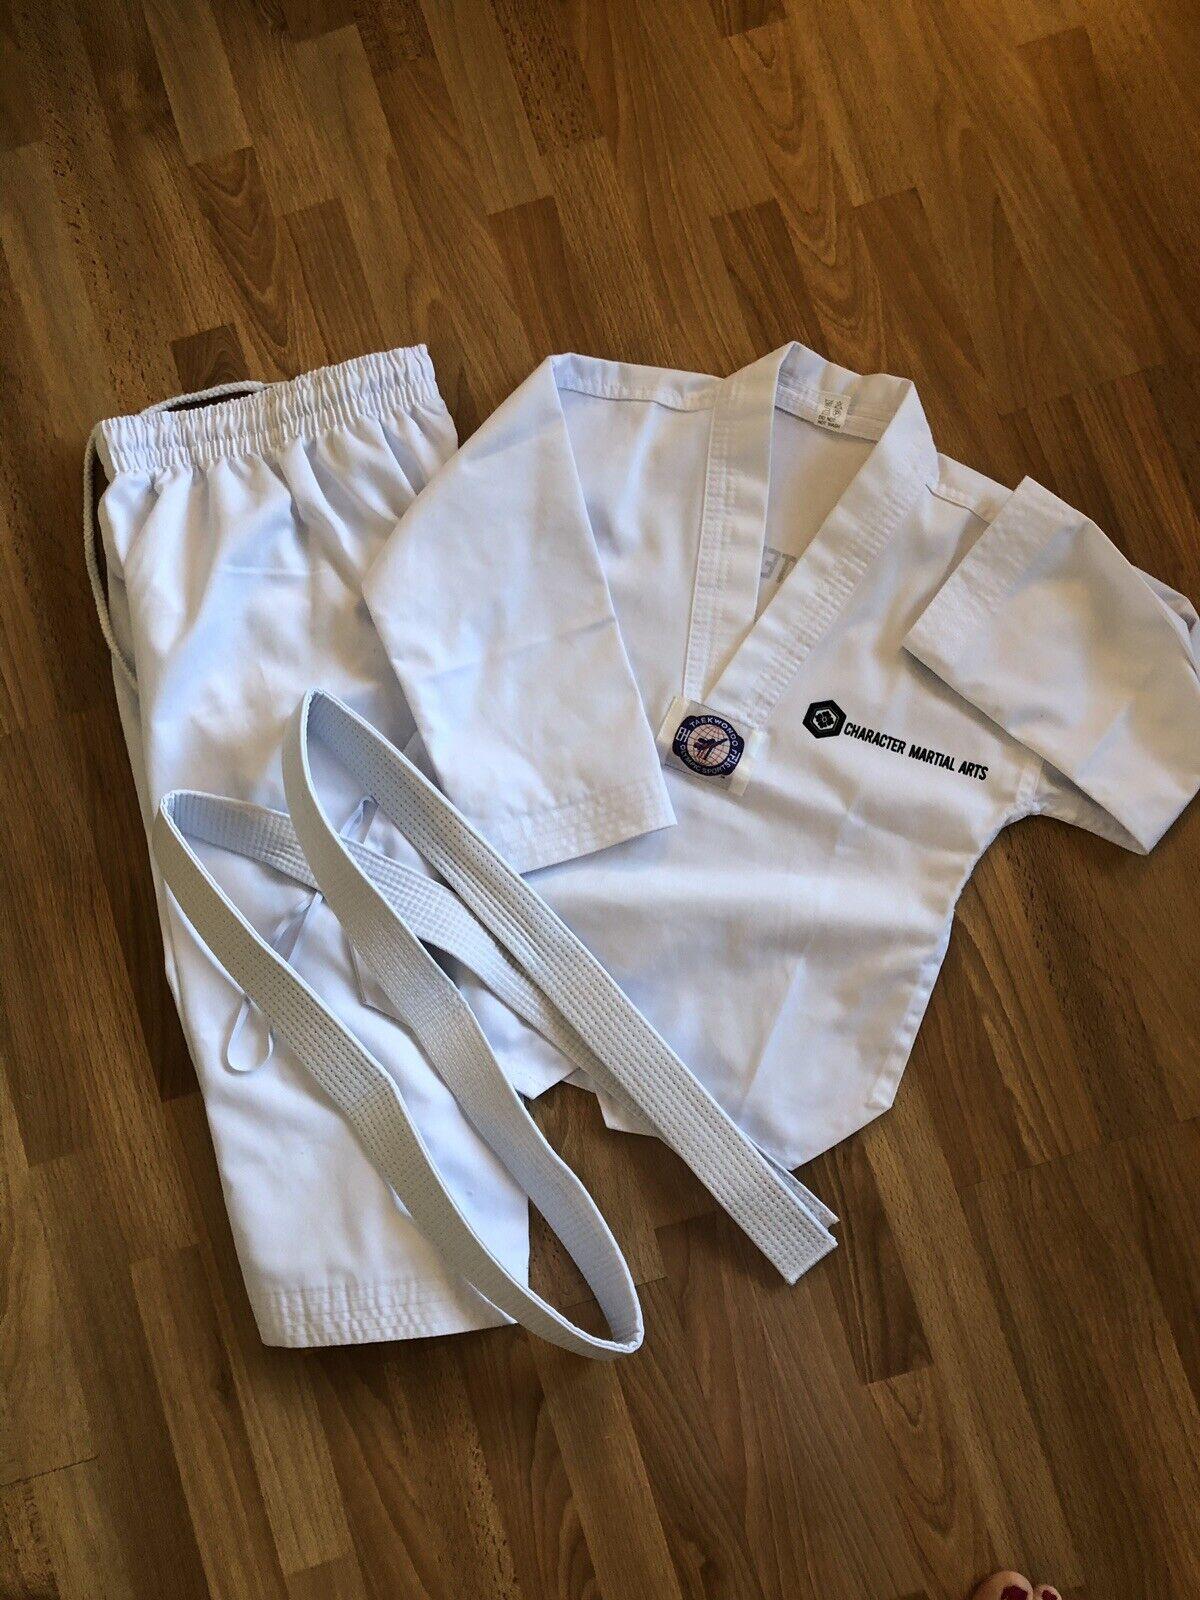 Karate Taekwando MMA Uniform Gi Robe Outfit, Size 110cm